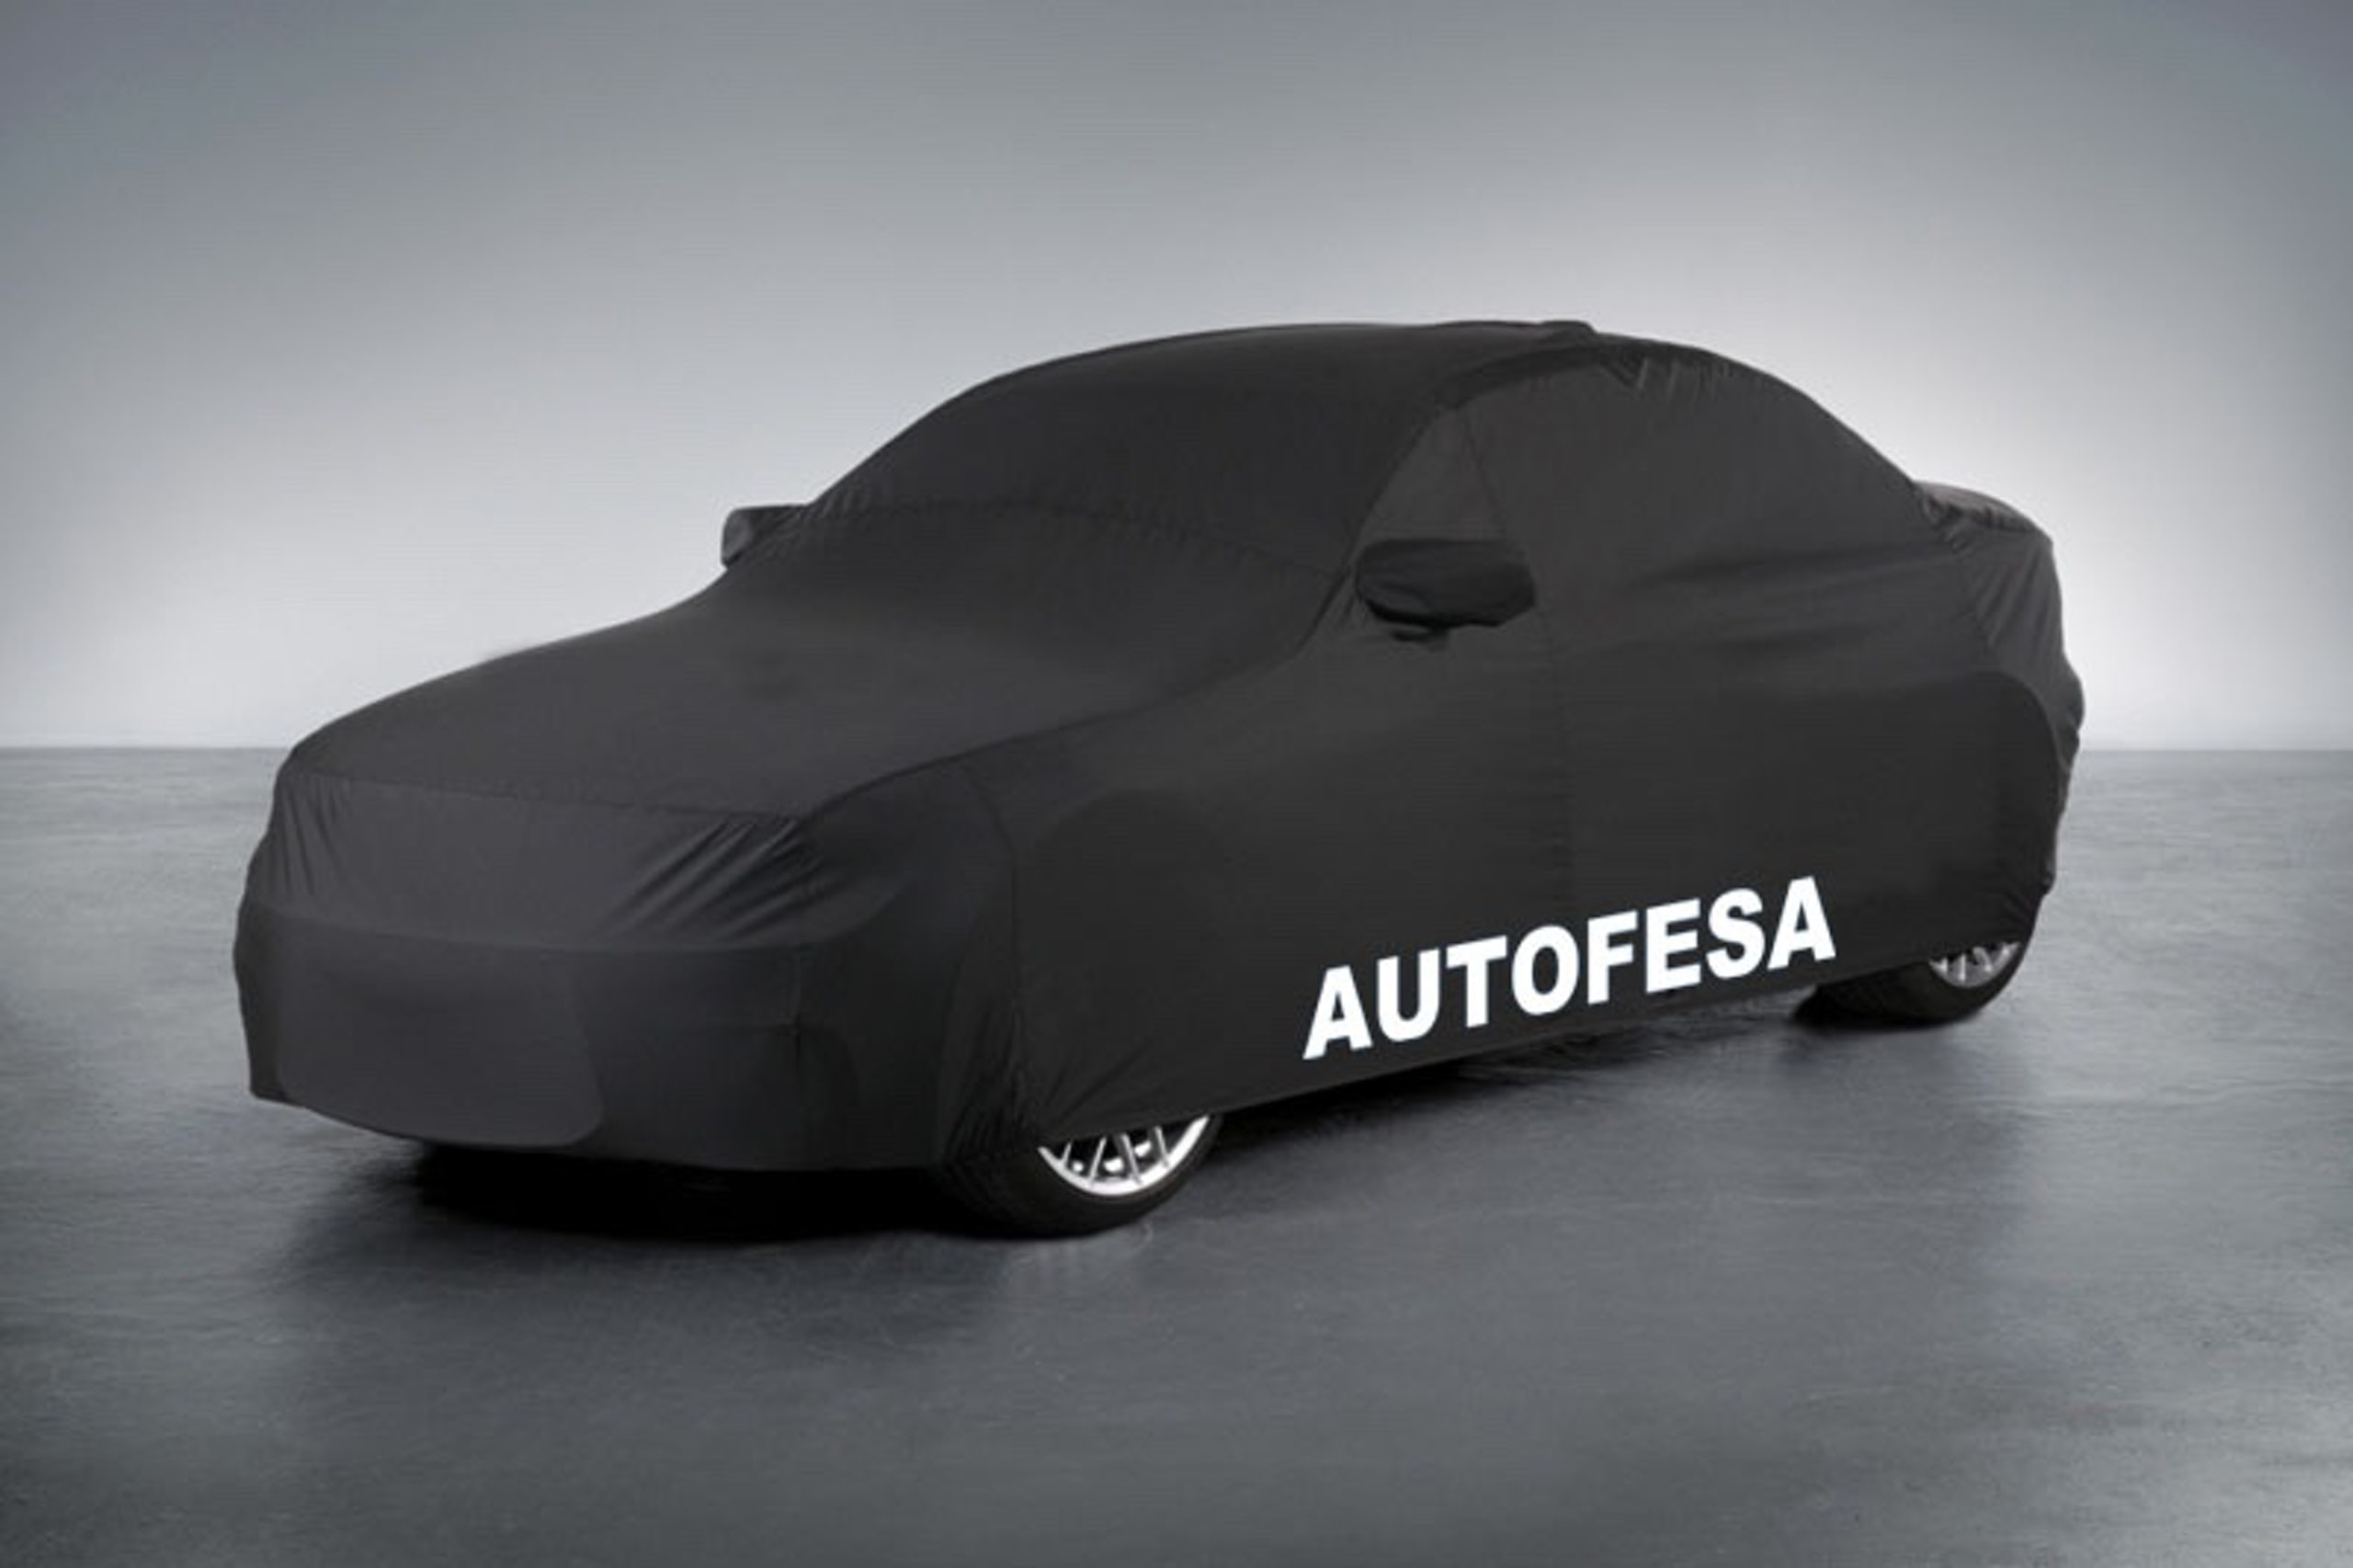 Subaru Forester 2.0TD 150cv Executive 5p Lineartronic 4x4 Auto